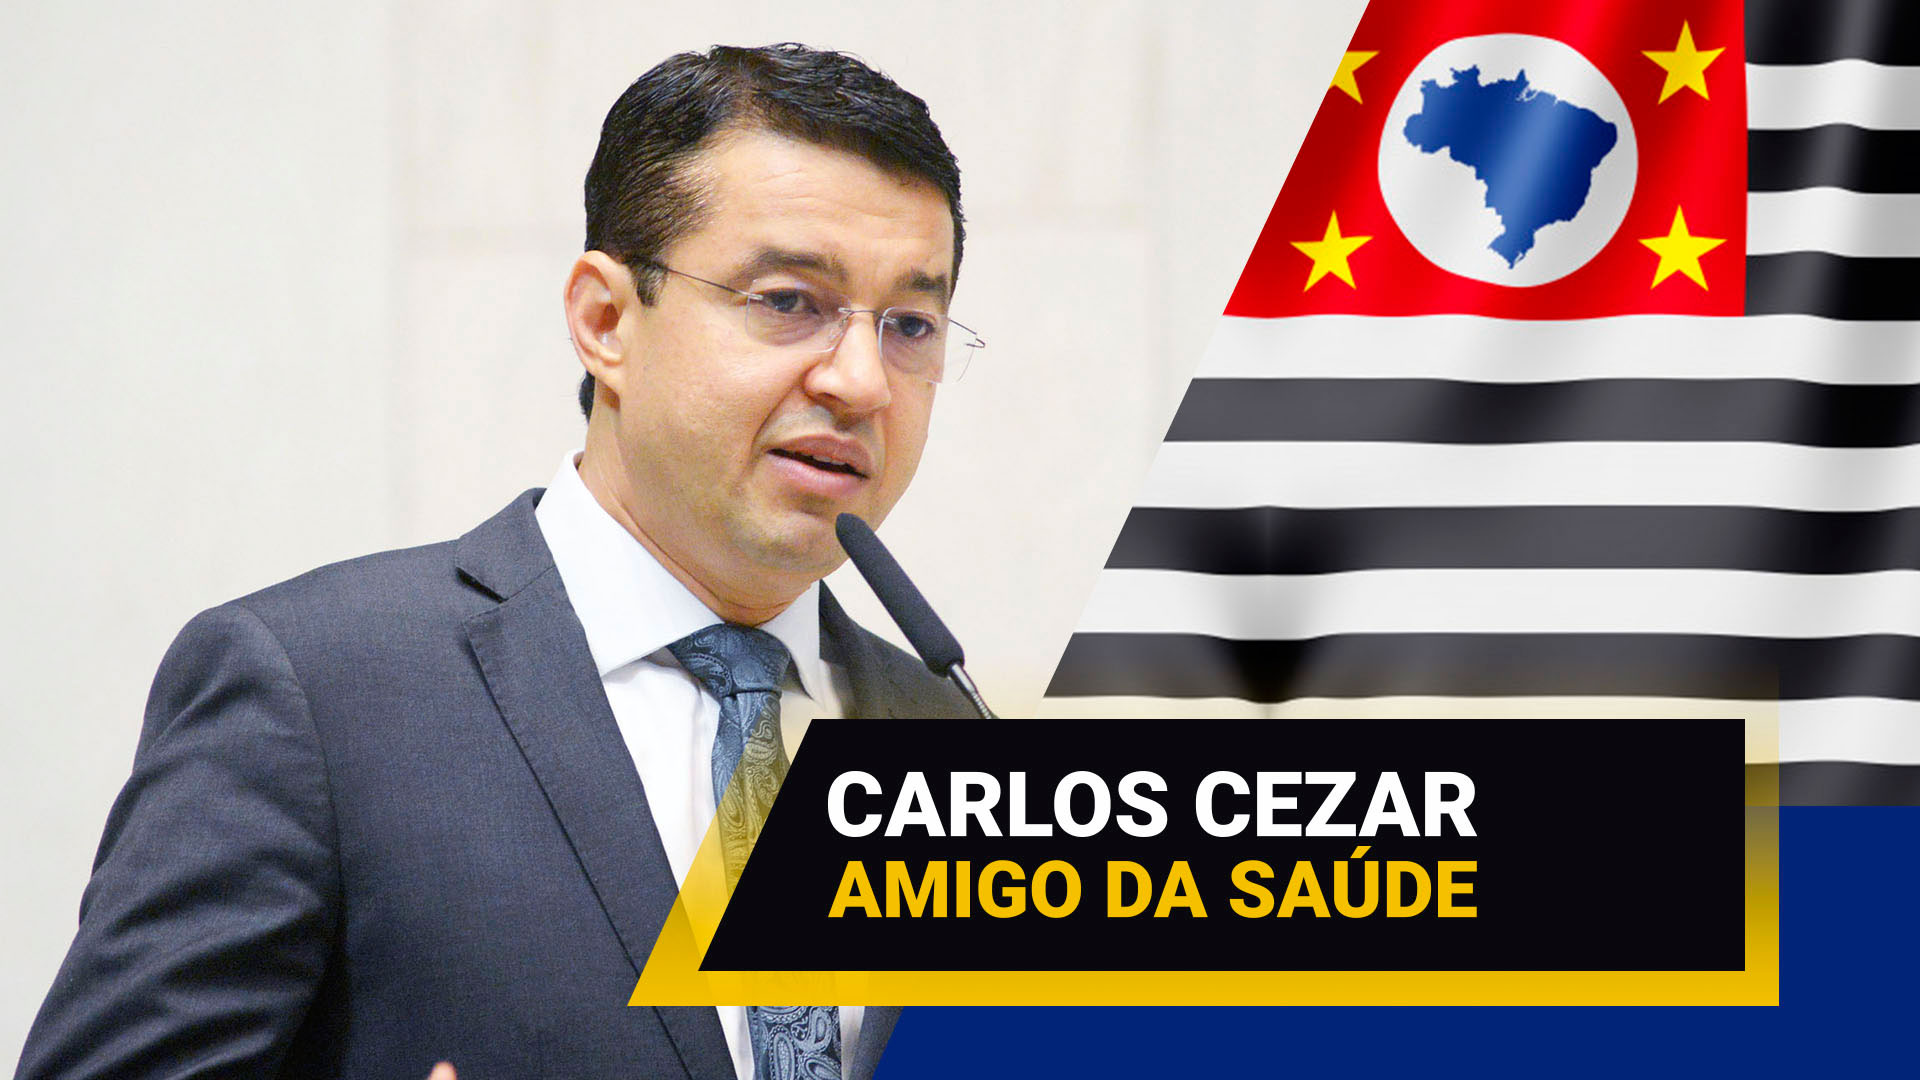 visita-ao-deputado-carlos-cezar - Acao Comunicativa